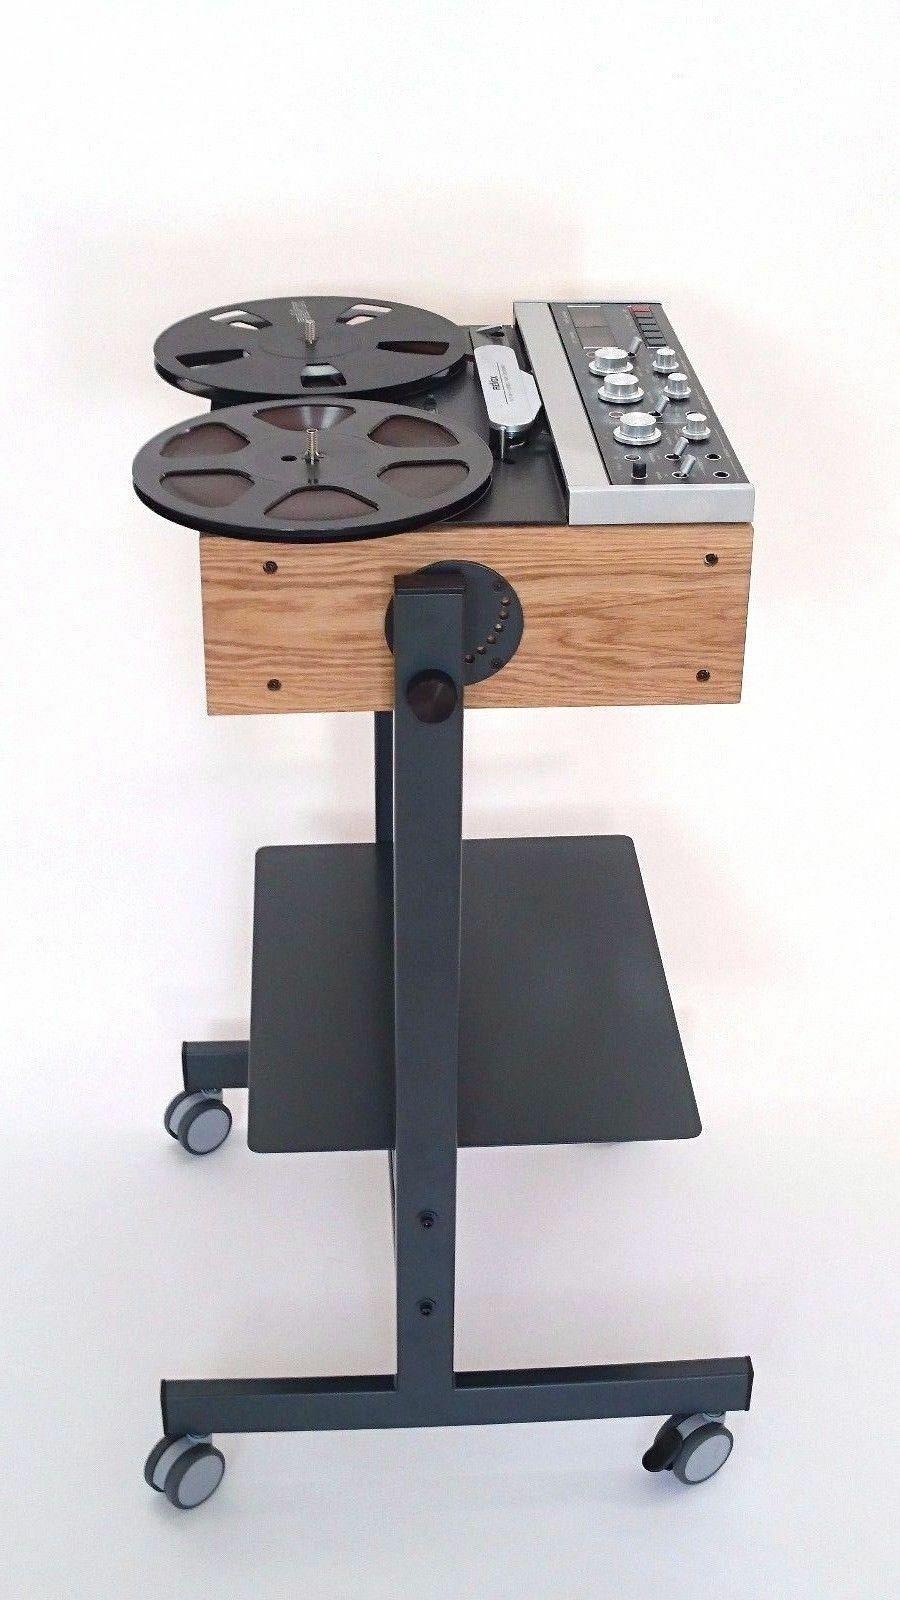 NEU Metall Holz Kabinett für Revox B-77 Tonbandgeräte Bandmaschine Tape Recorder